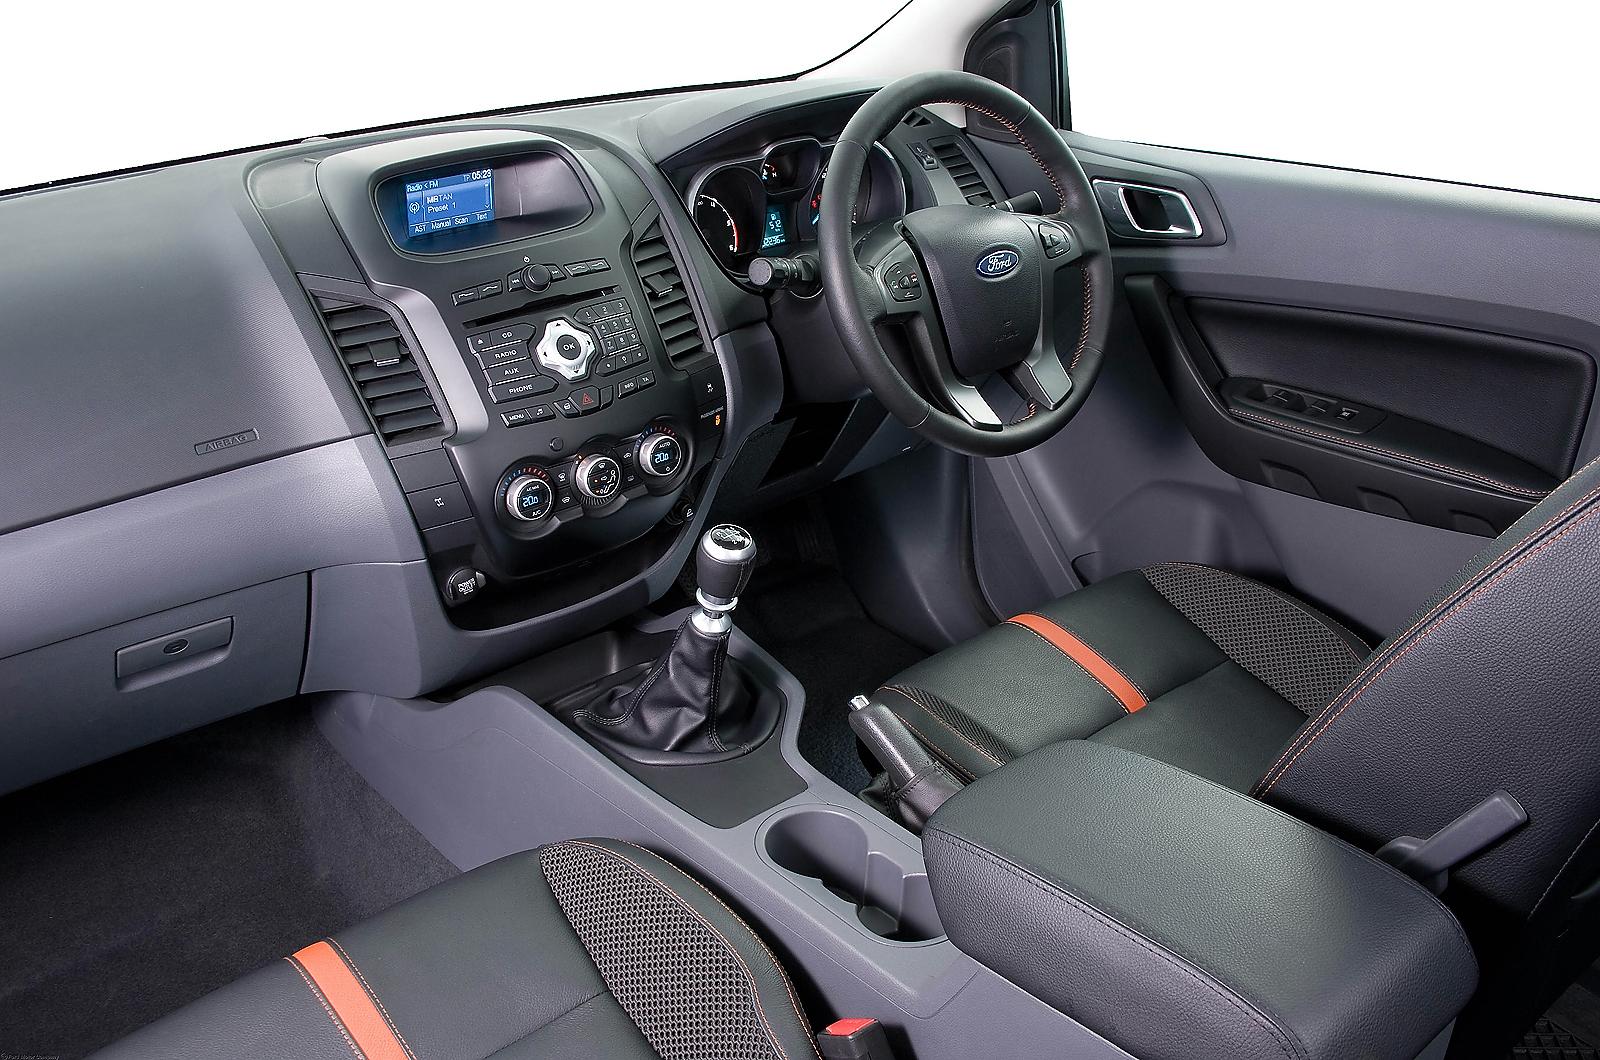 VWVortexcom  Autocar drives the new UK Ford Ranger pickup